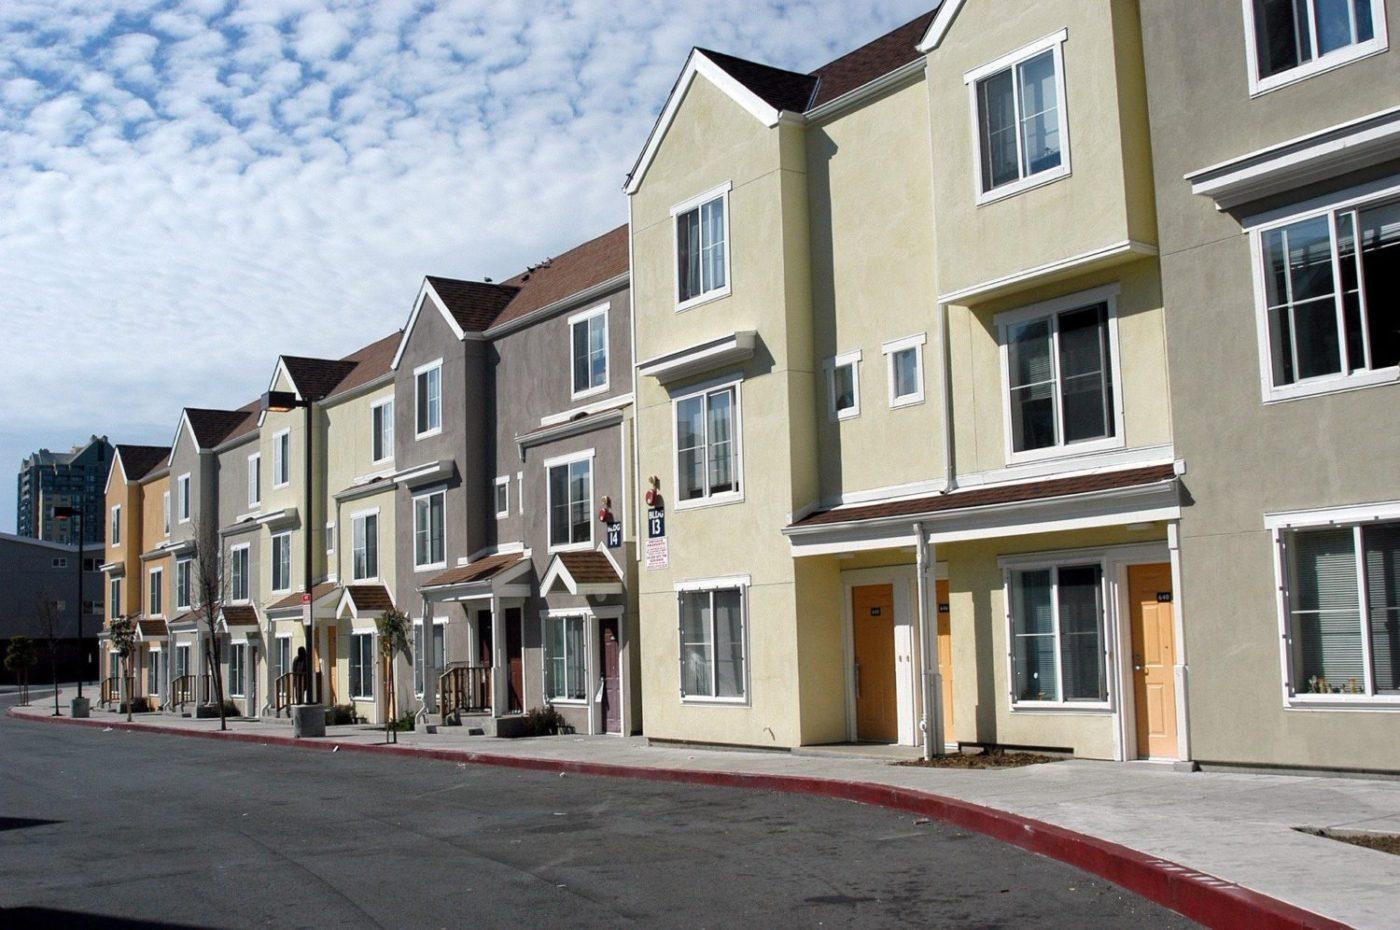 Plaza-East-Apartments-1400x930, San Francisco's and McCormack Baron Salazar's criminal neglect of Plaza East Apartments, Local News & Views